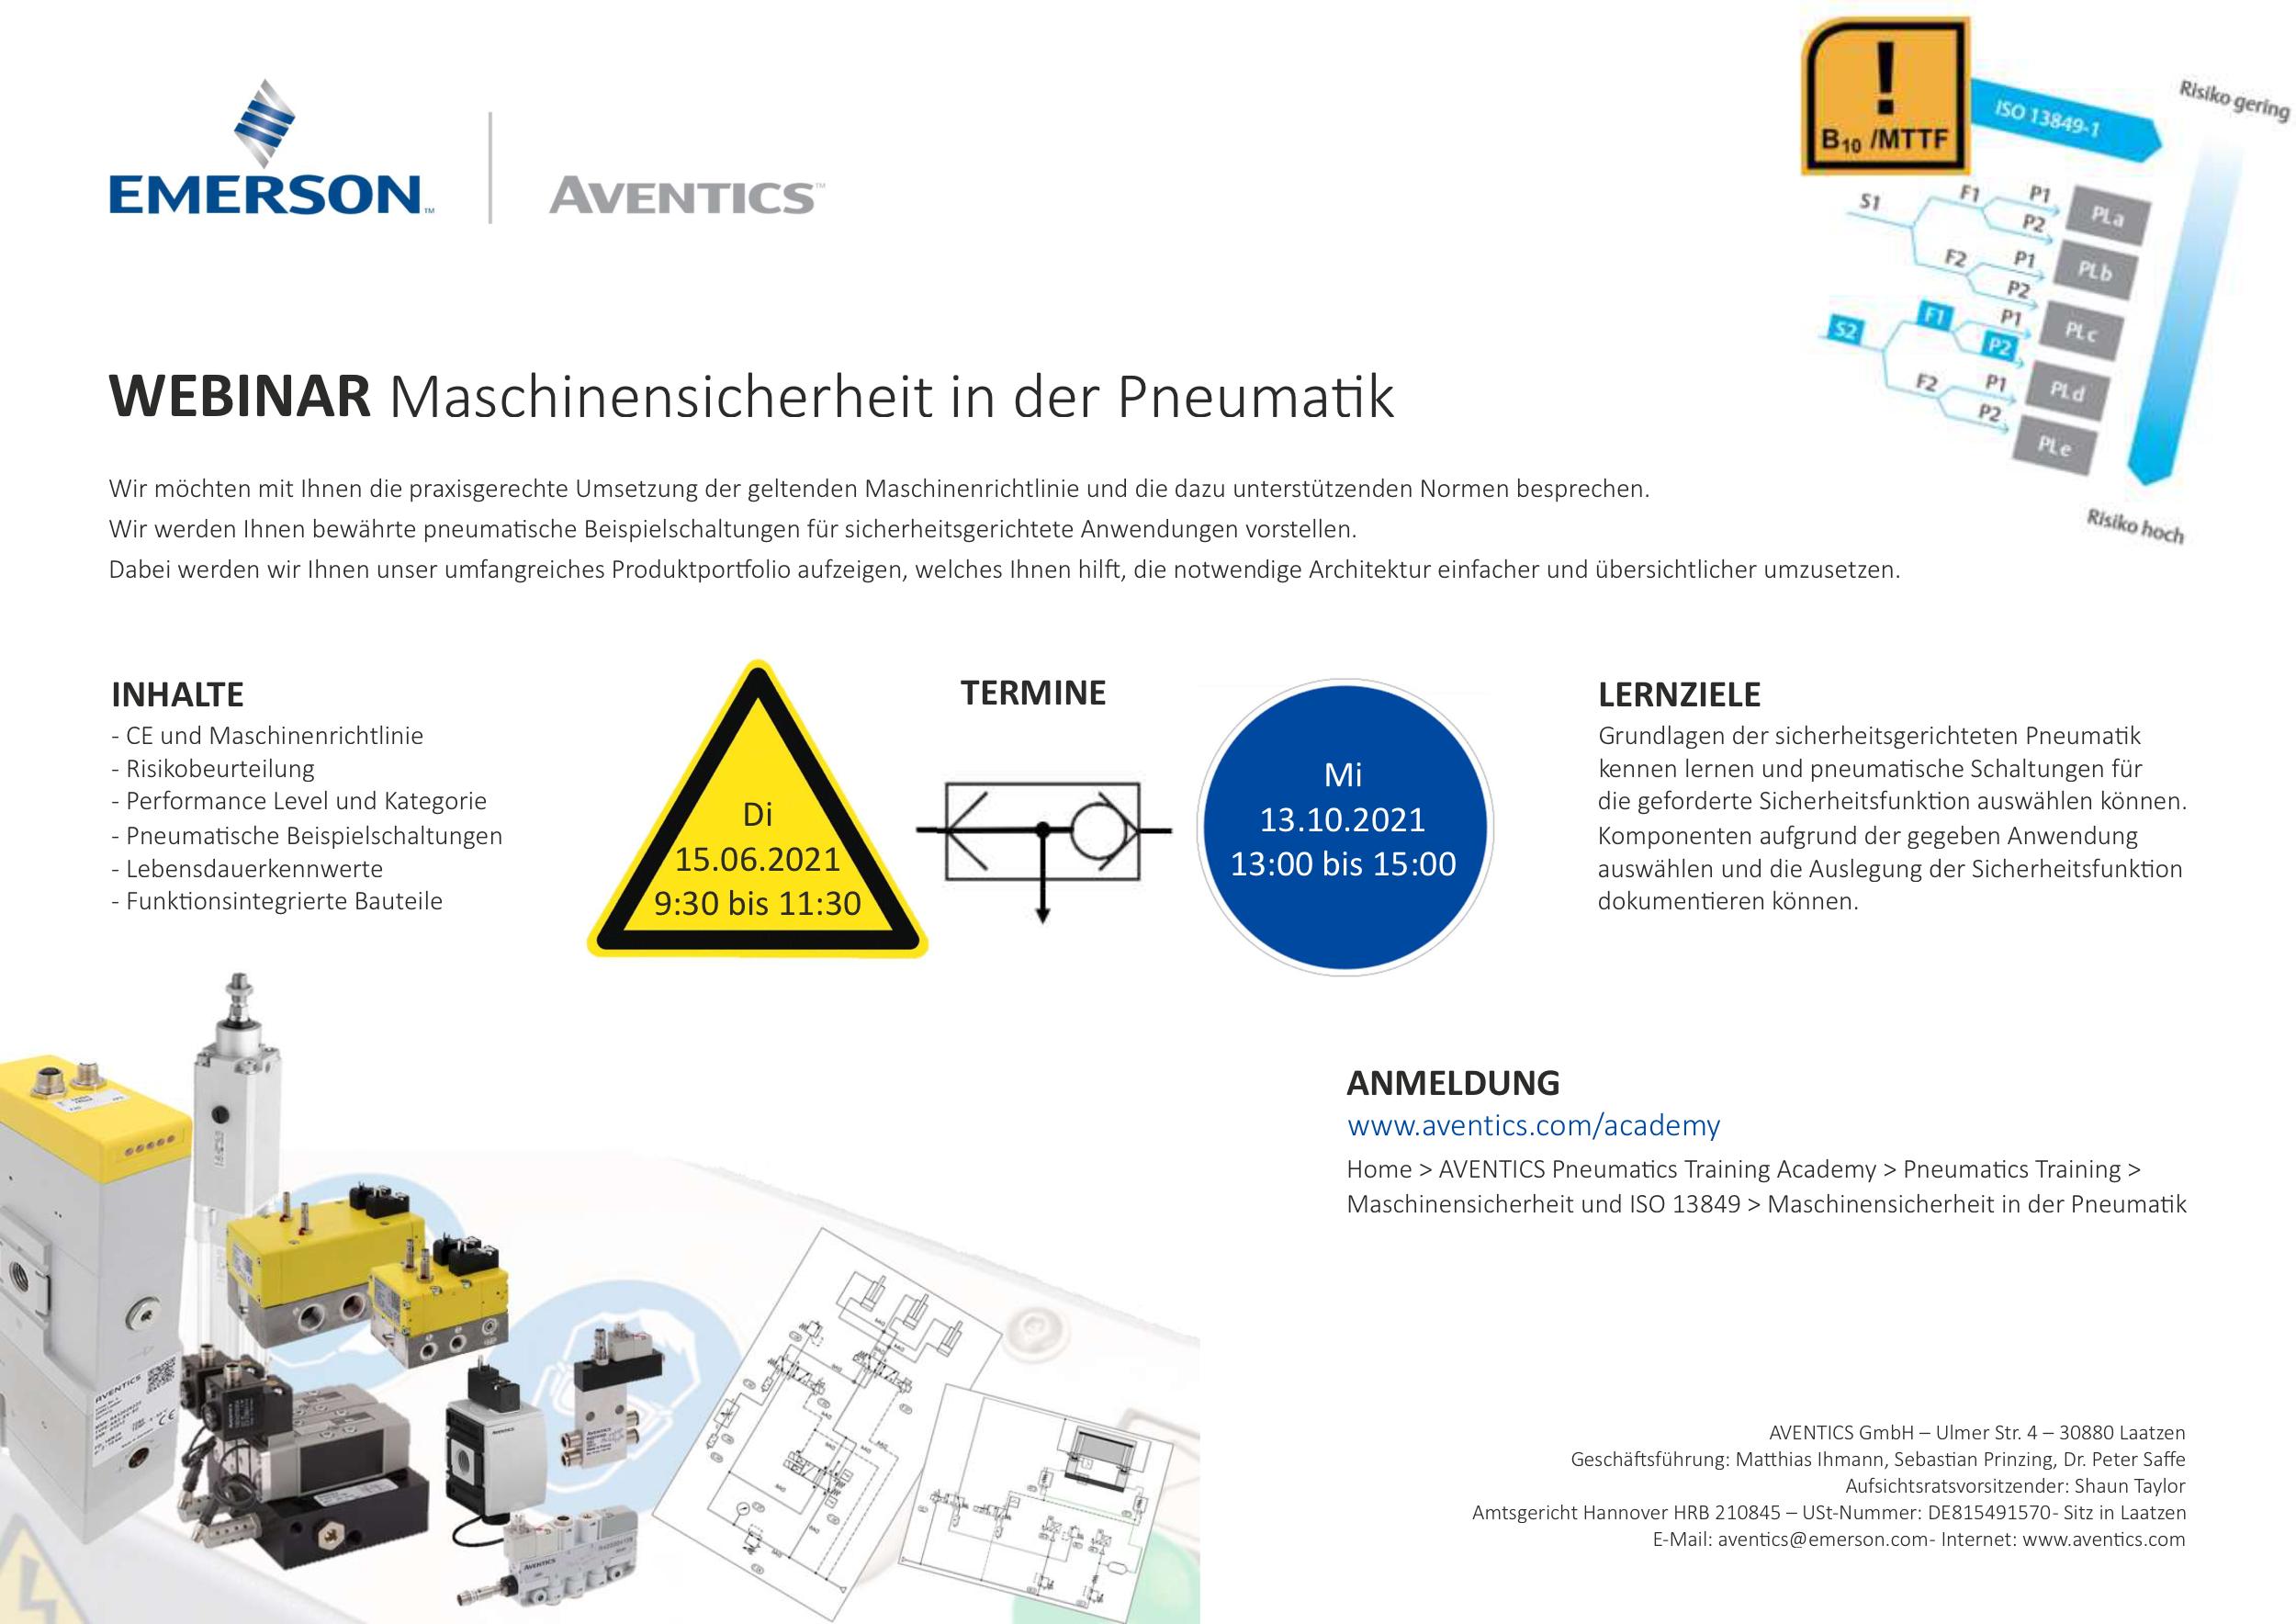 WEBINAR: Maschinensicherheit in der Pneumatik